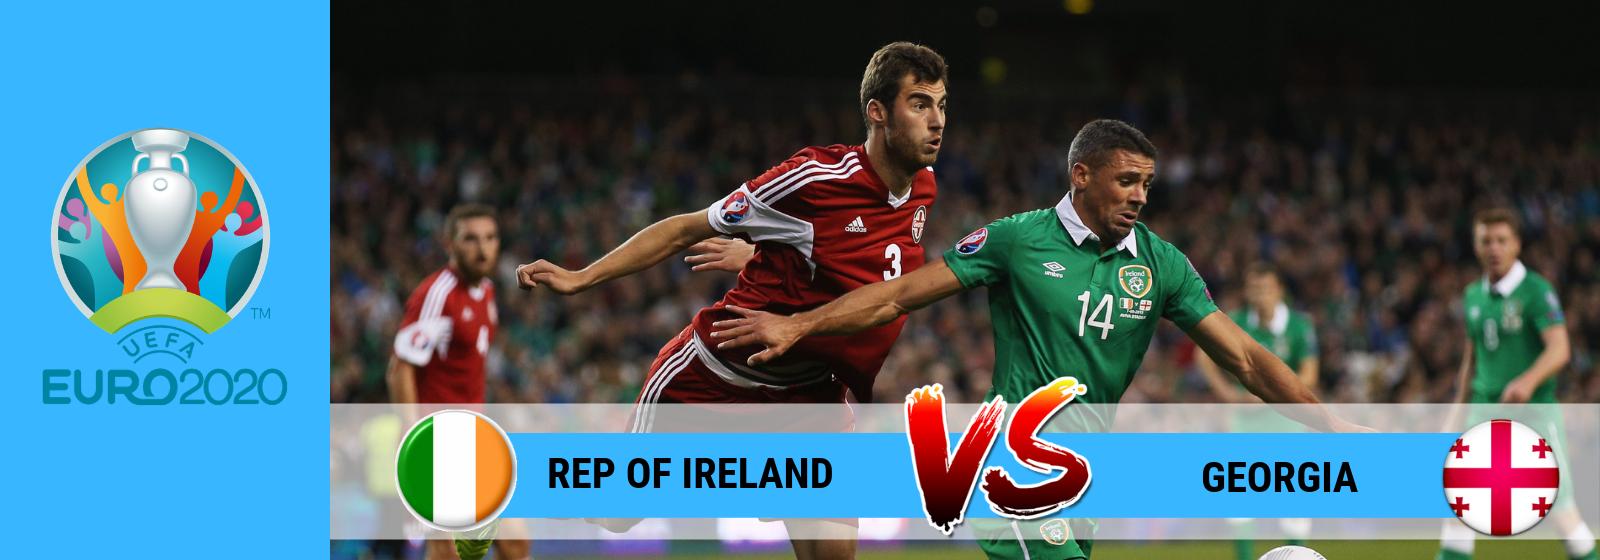 Rep of Ireland vs Georgia AsianConnect